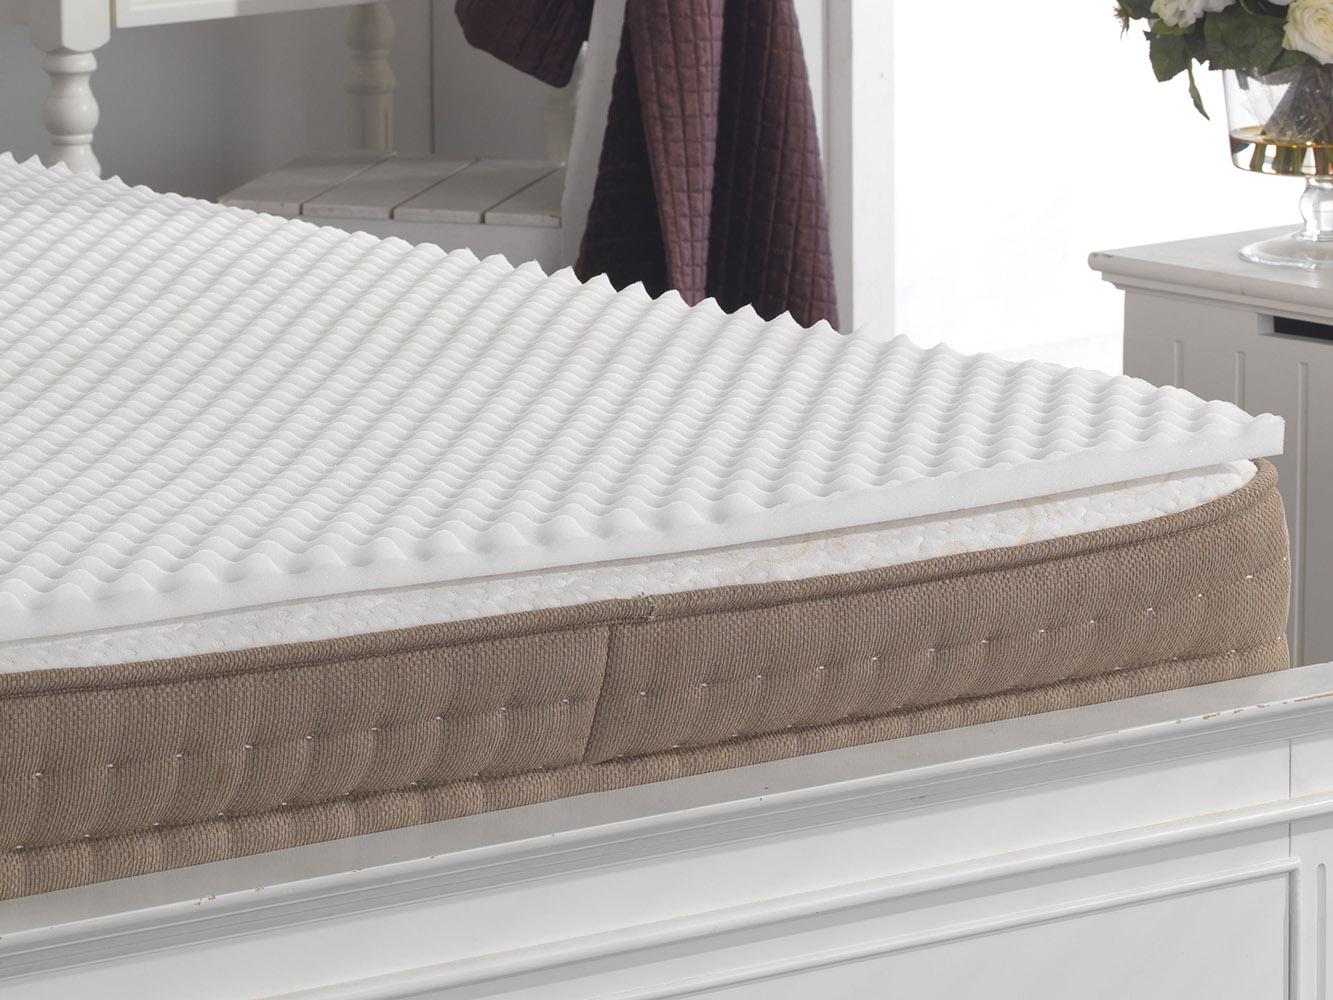 back support pain relief egg box foam mattress pad topper. Black Bedroom Furniture Sets. Home Design Ideas